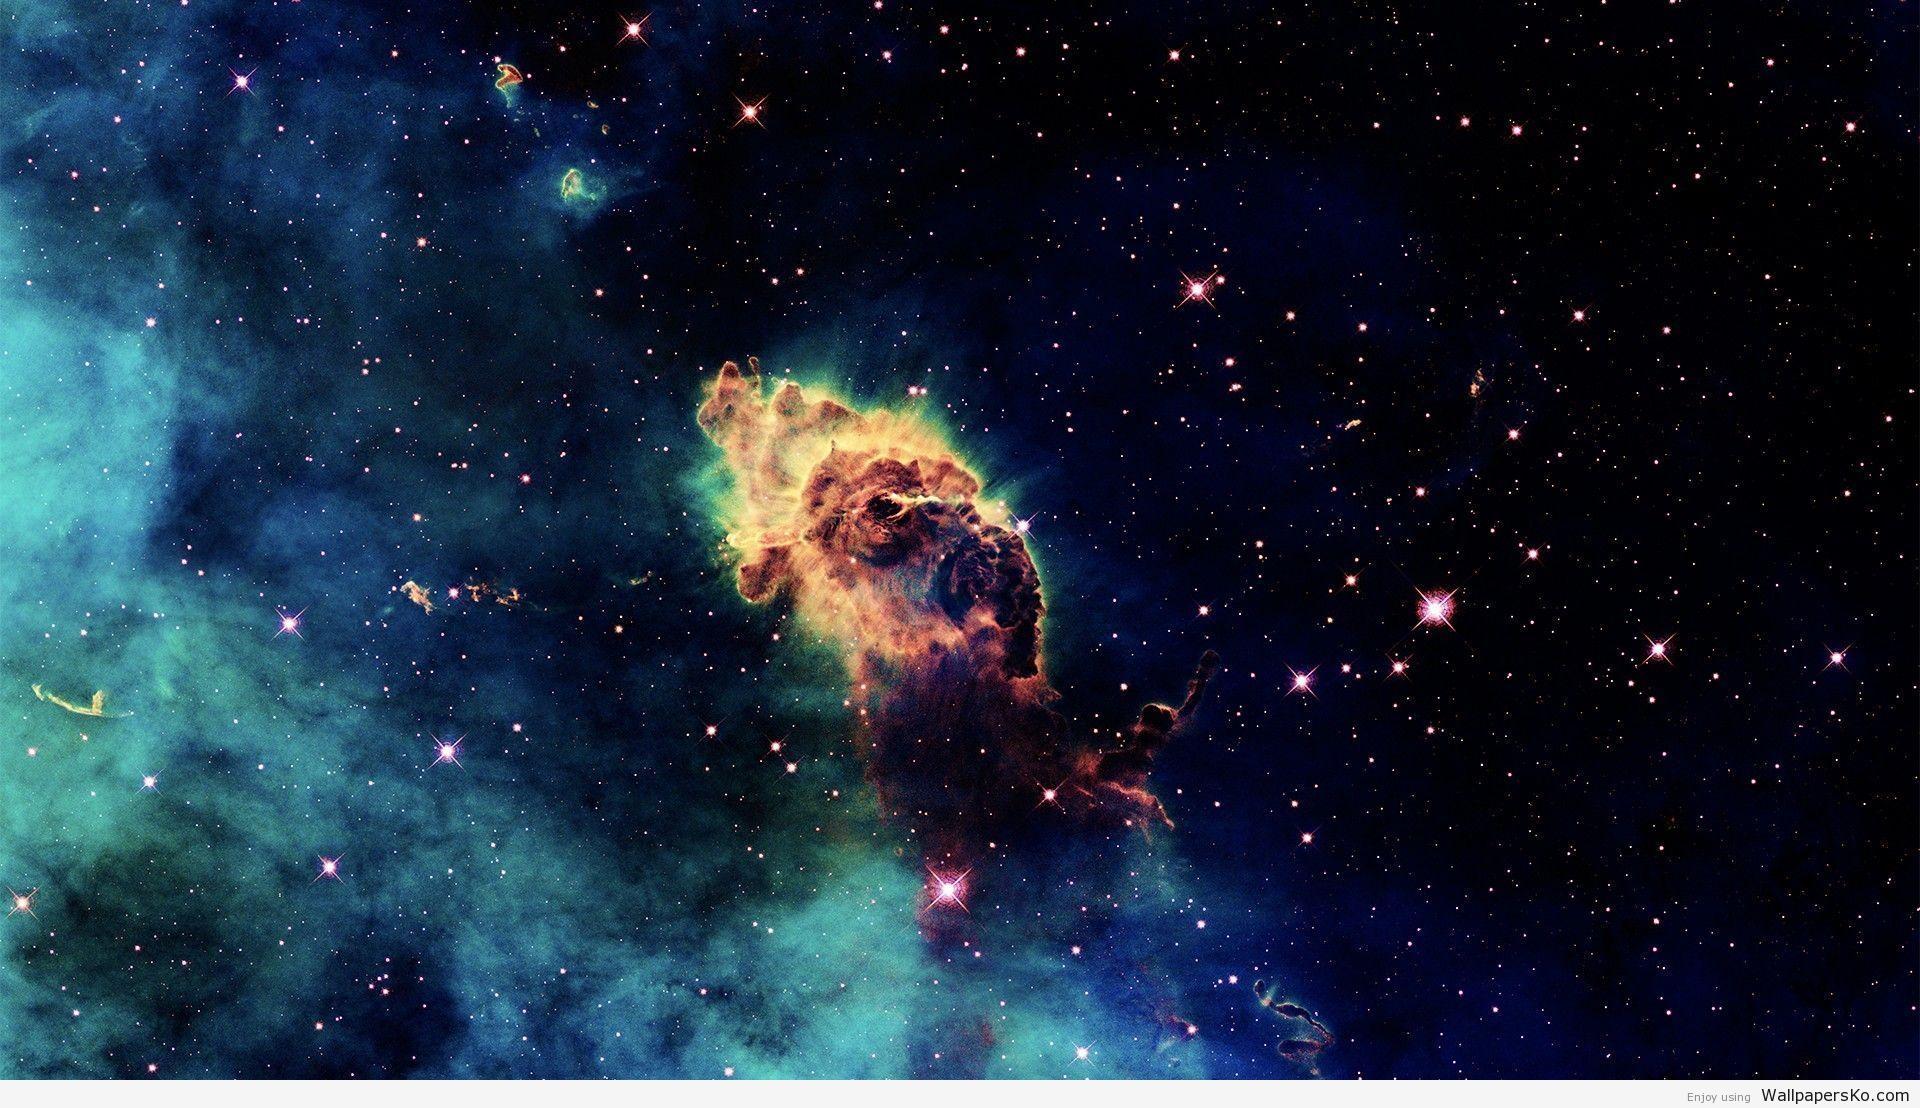 1080p space wallpaper